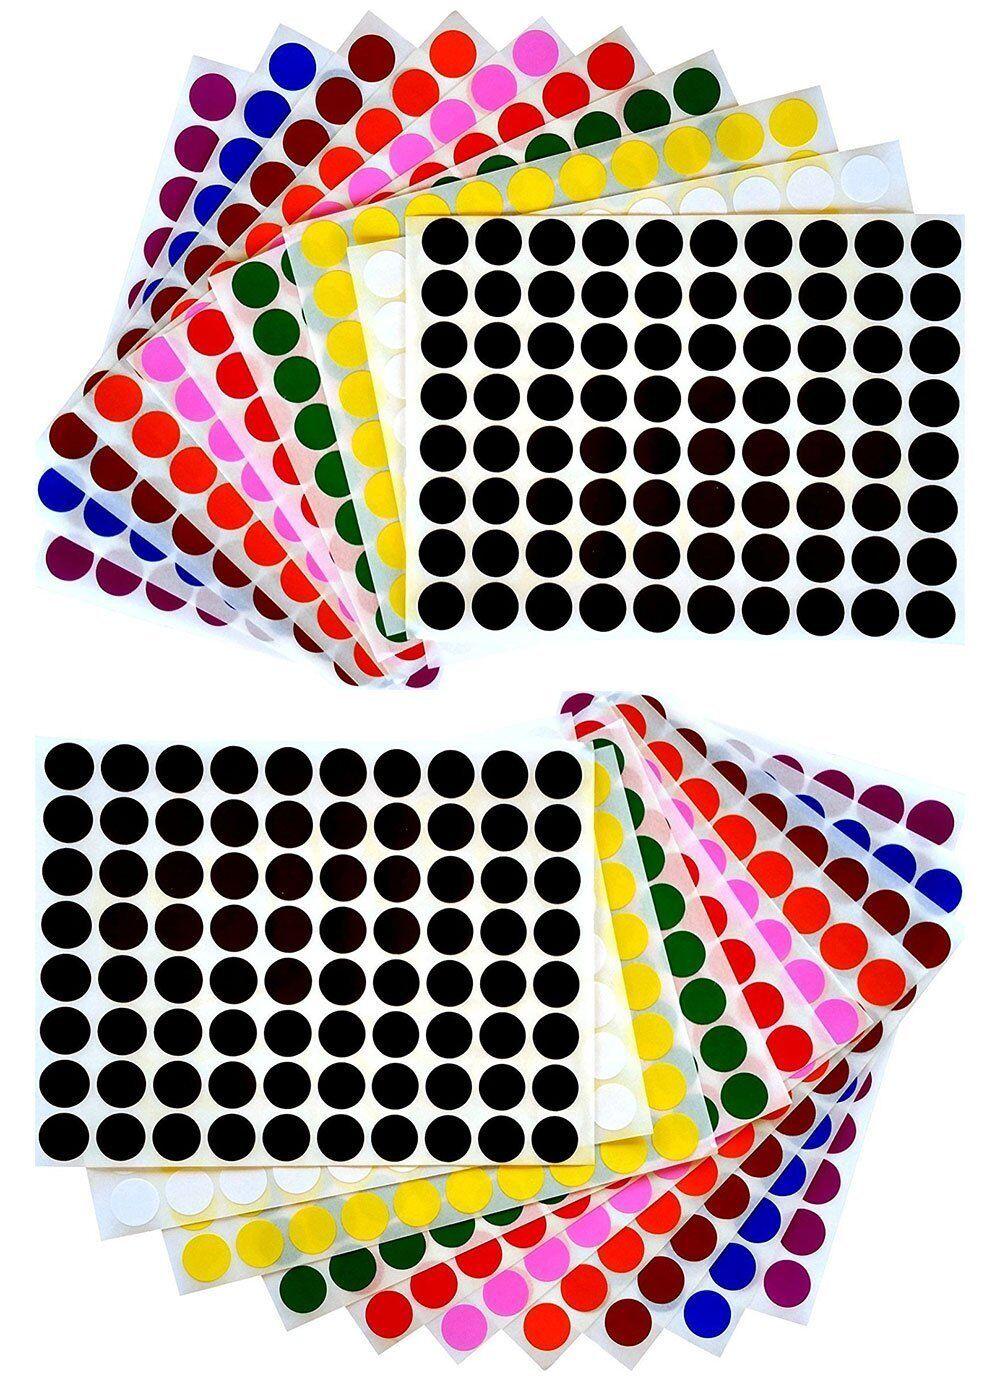 colour code Red 19mm dot//circular sticker x 150